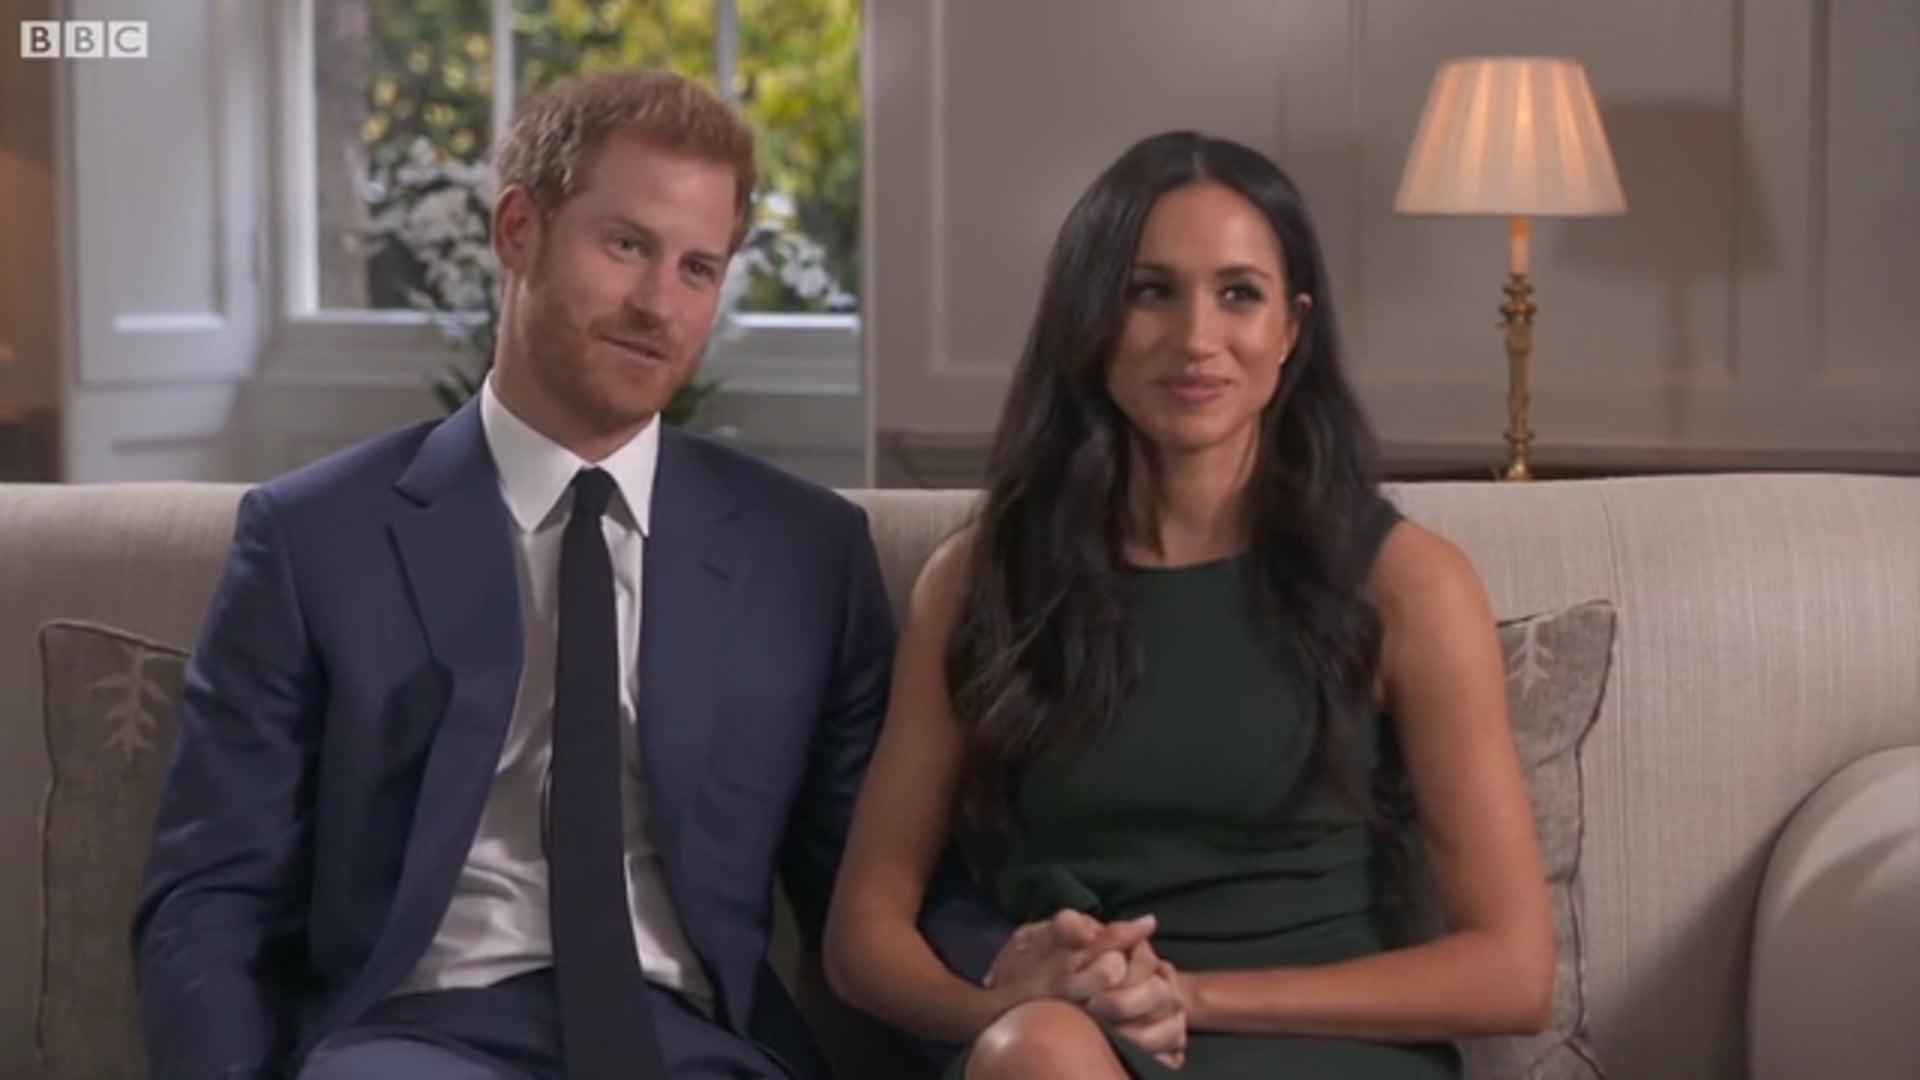 Harry and Meghan Engagement - BBC - Rupert Binsley